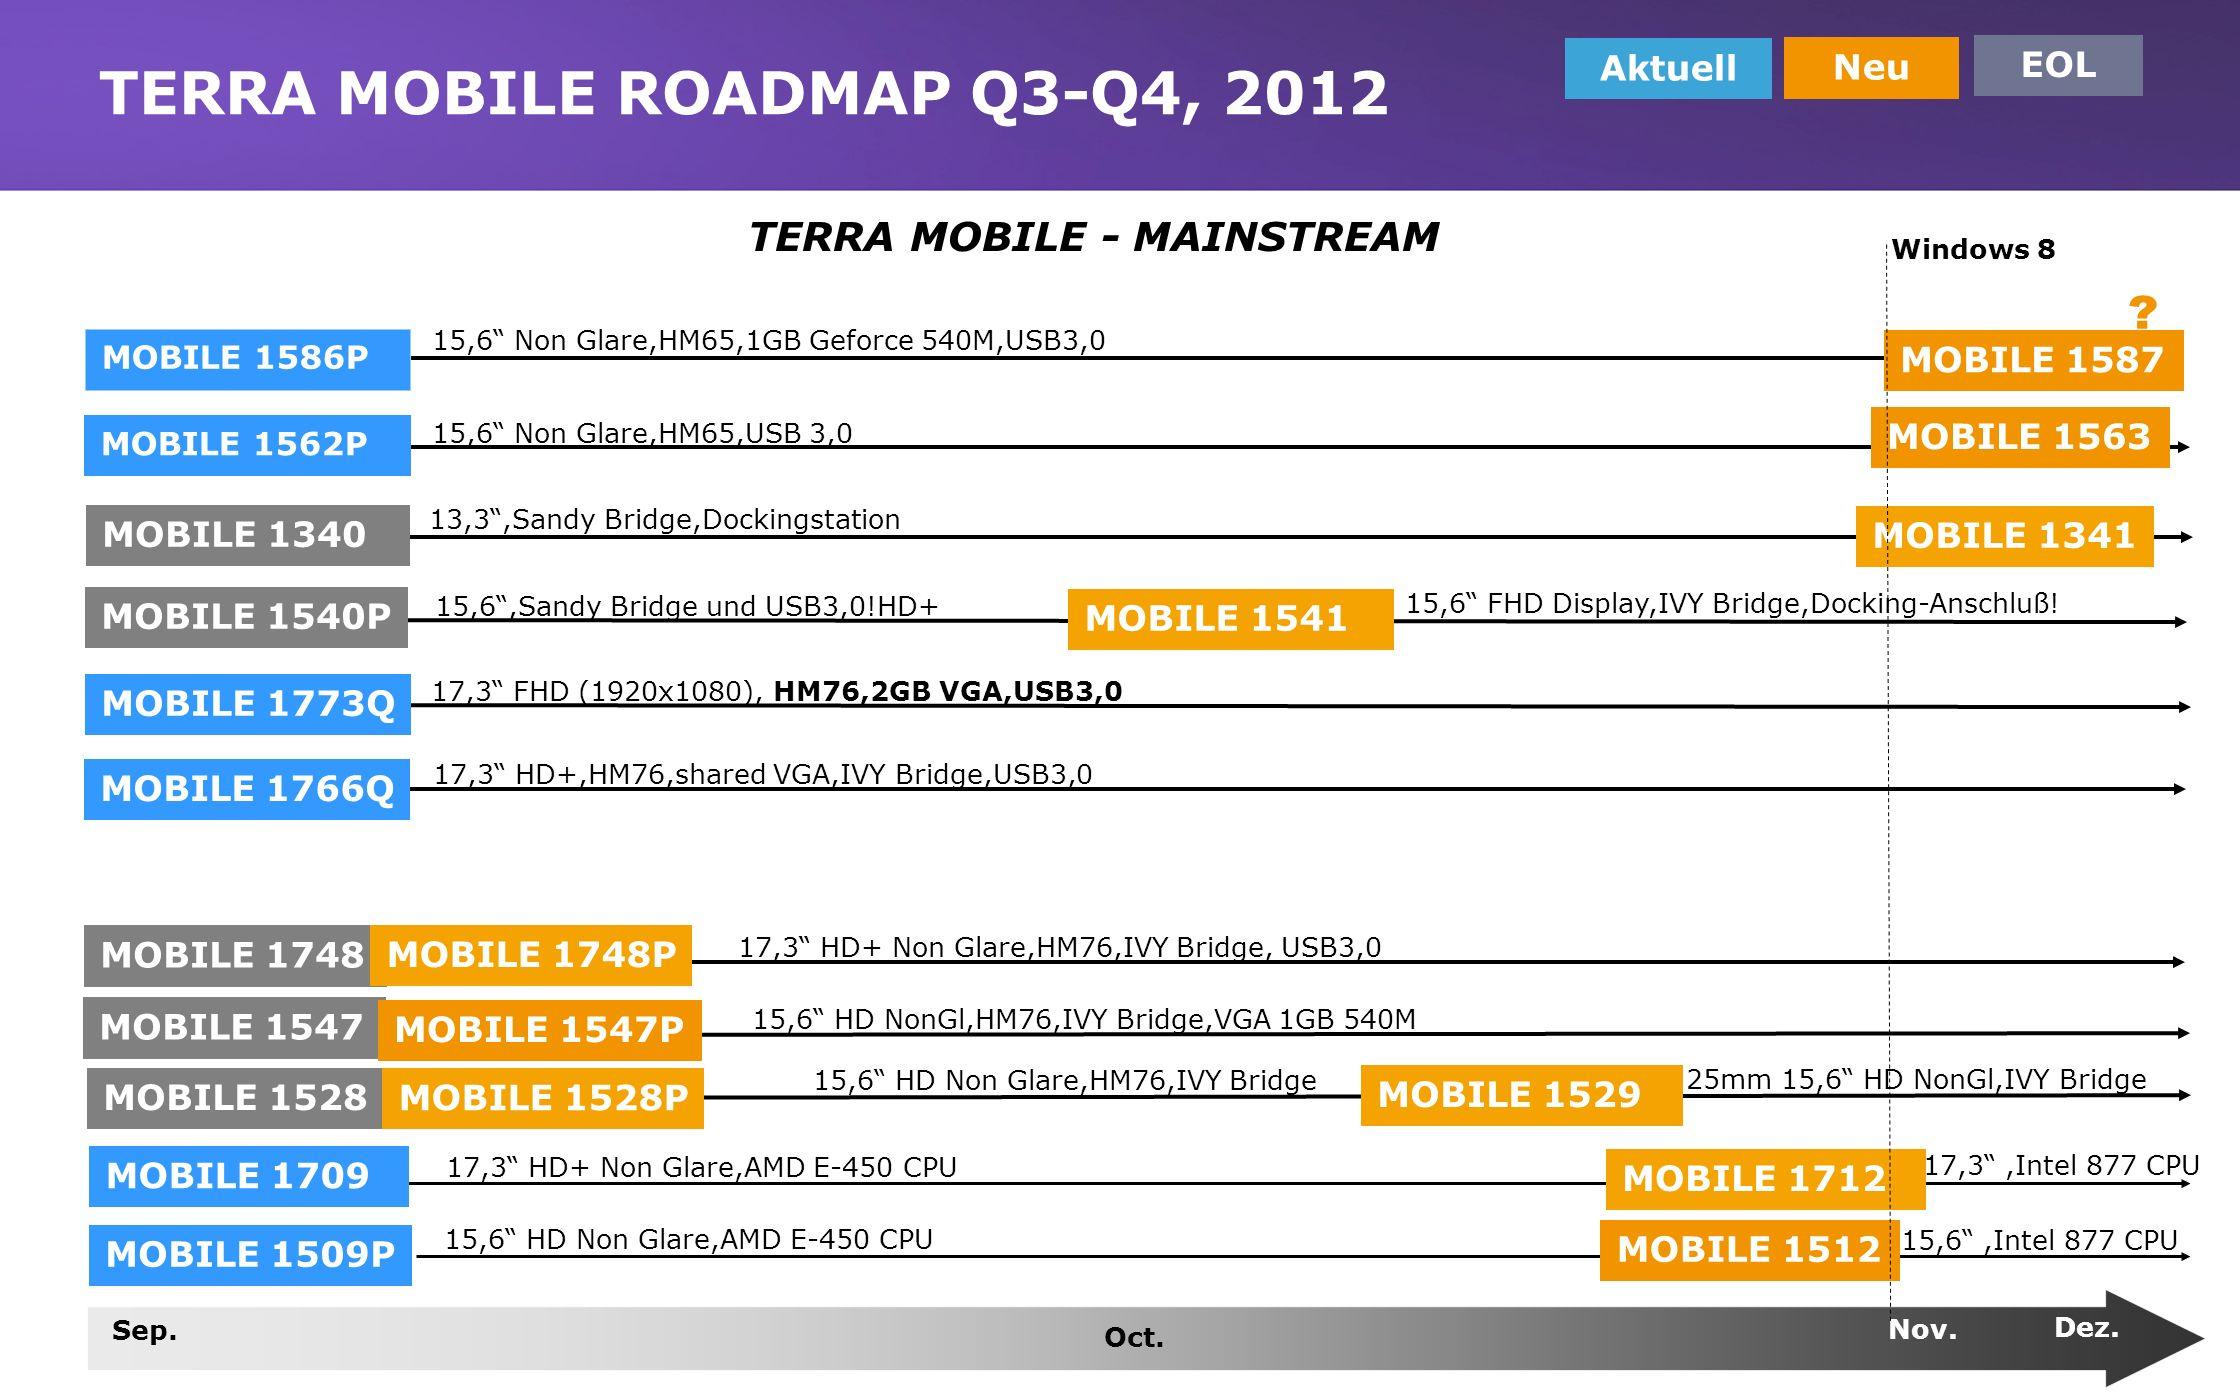 www.wortmann.de TERRA MOBILE ROADMAP Q3-Q4, 2012 Aktuell Neu EOL MOBILE 1586P 15,6 Non Glare,HM65,1GB Geforce 540M,USB3,0 MOBILE 1562P 15,6 Non Glare,